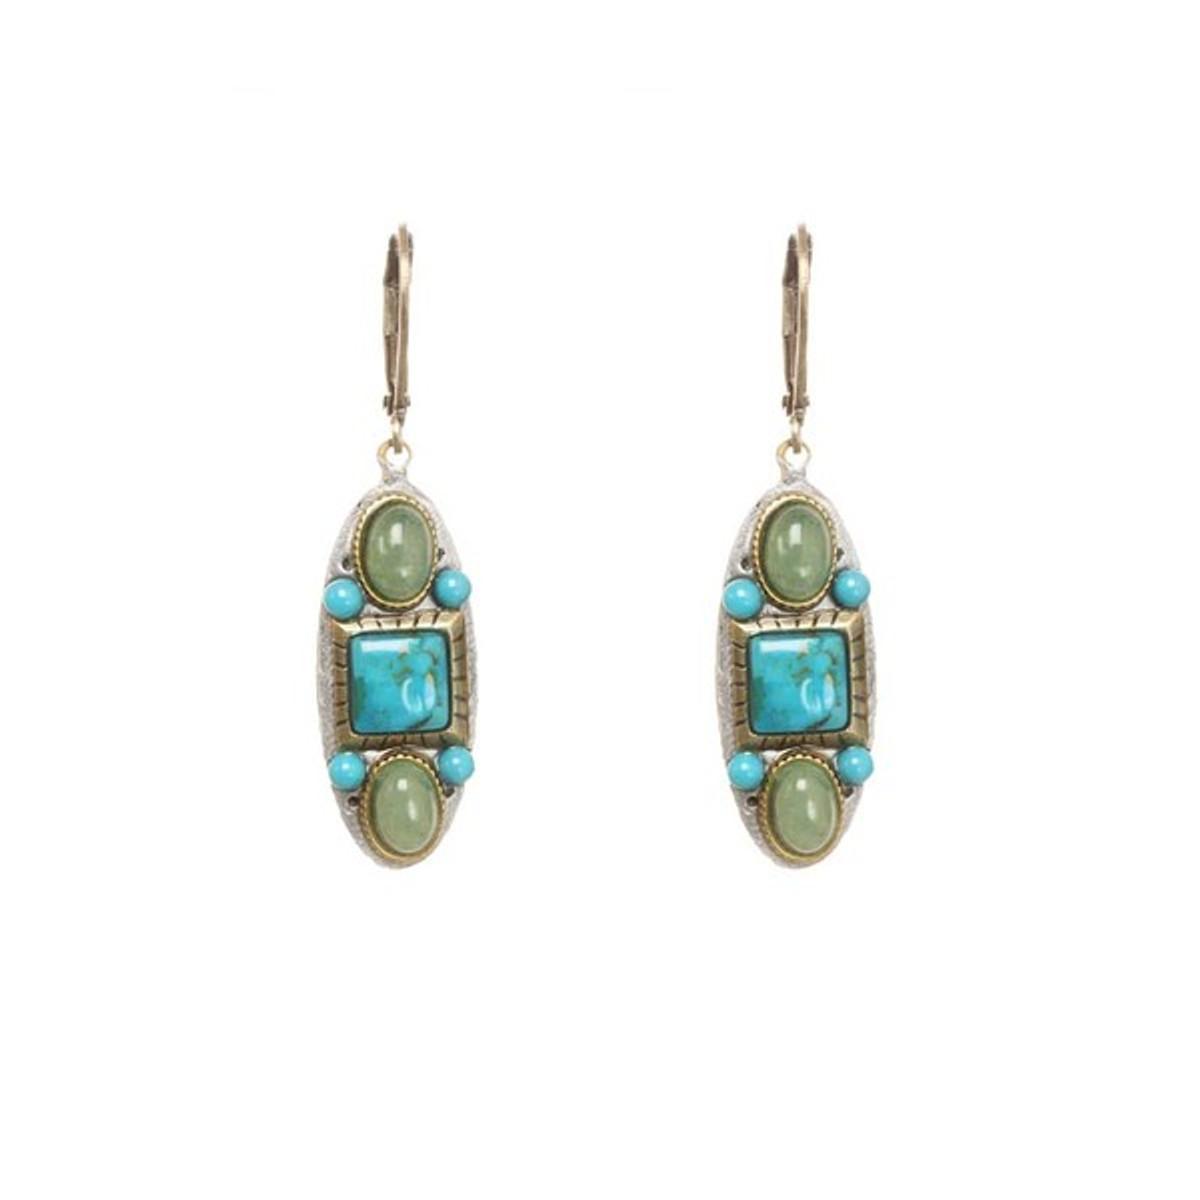 Michal Golan Earrings Nile Turquoise